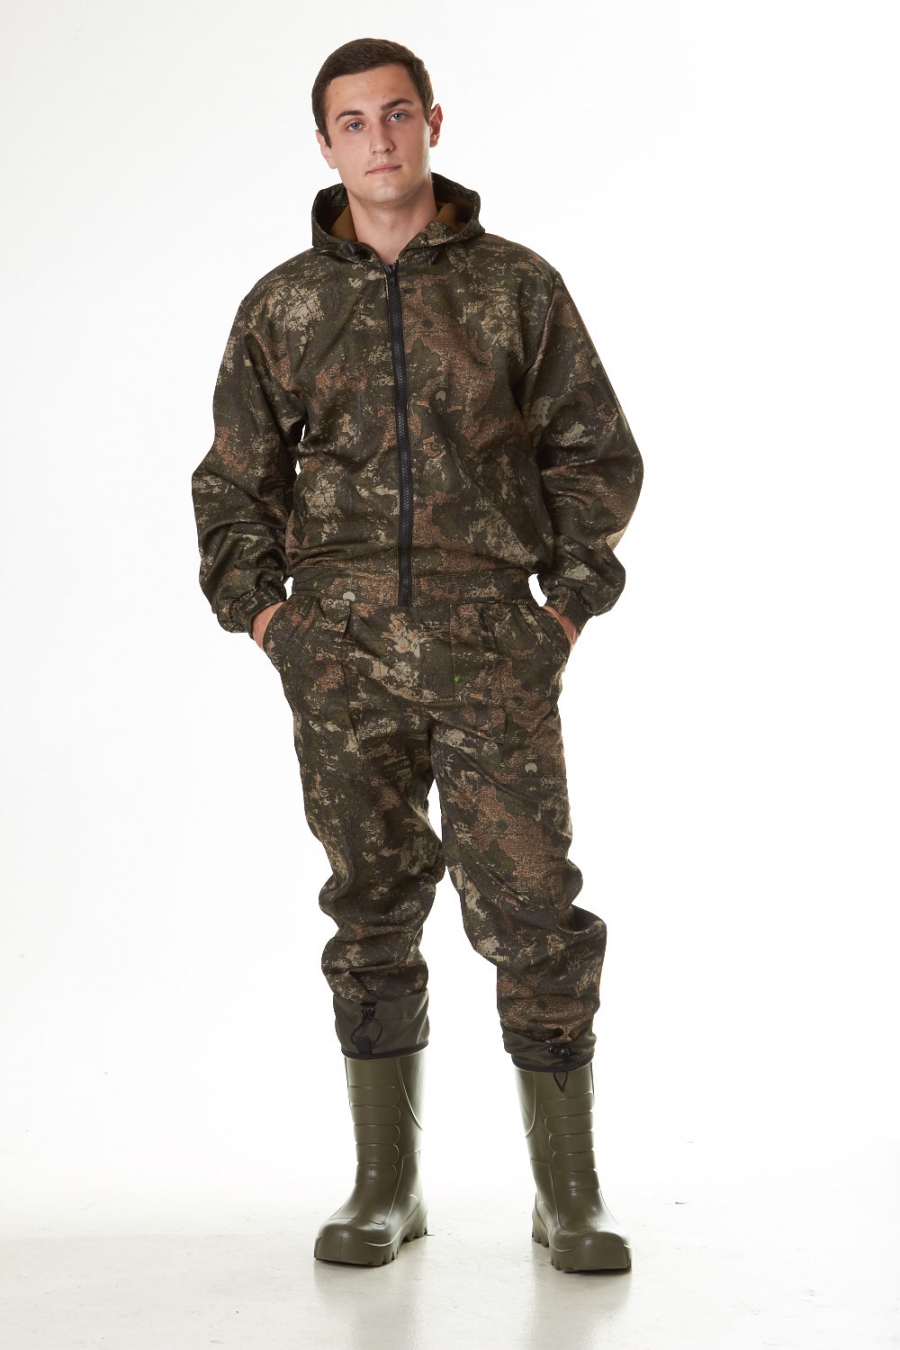 Костюм для охоты и рыбалки ЛесникОдежда для охоты и рыбалки<br><br><br>Размер: 58